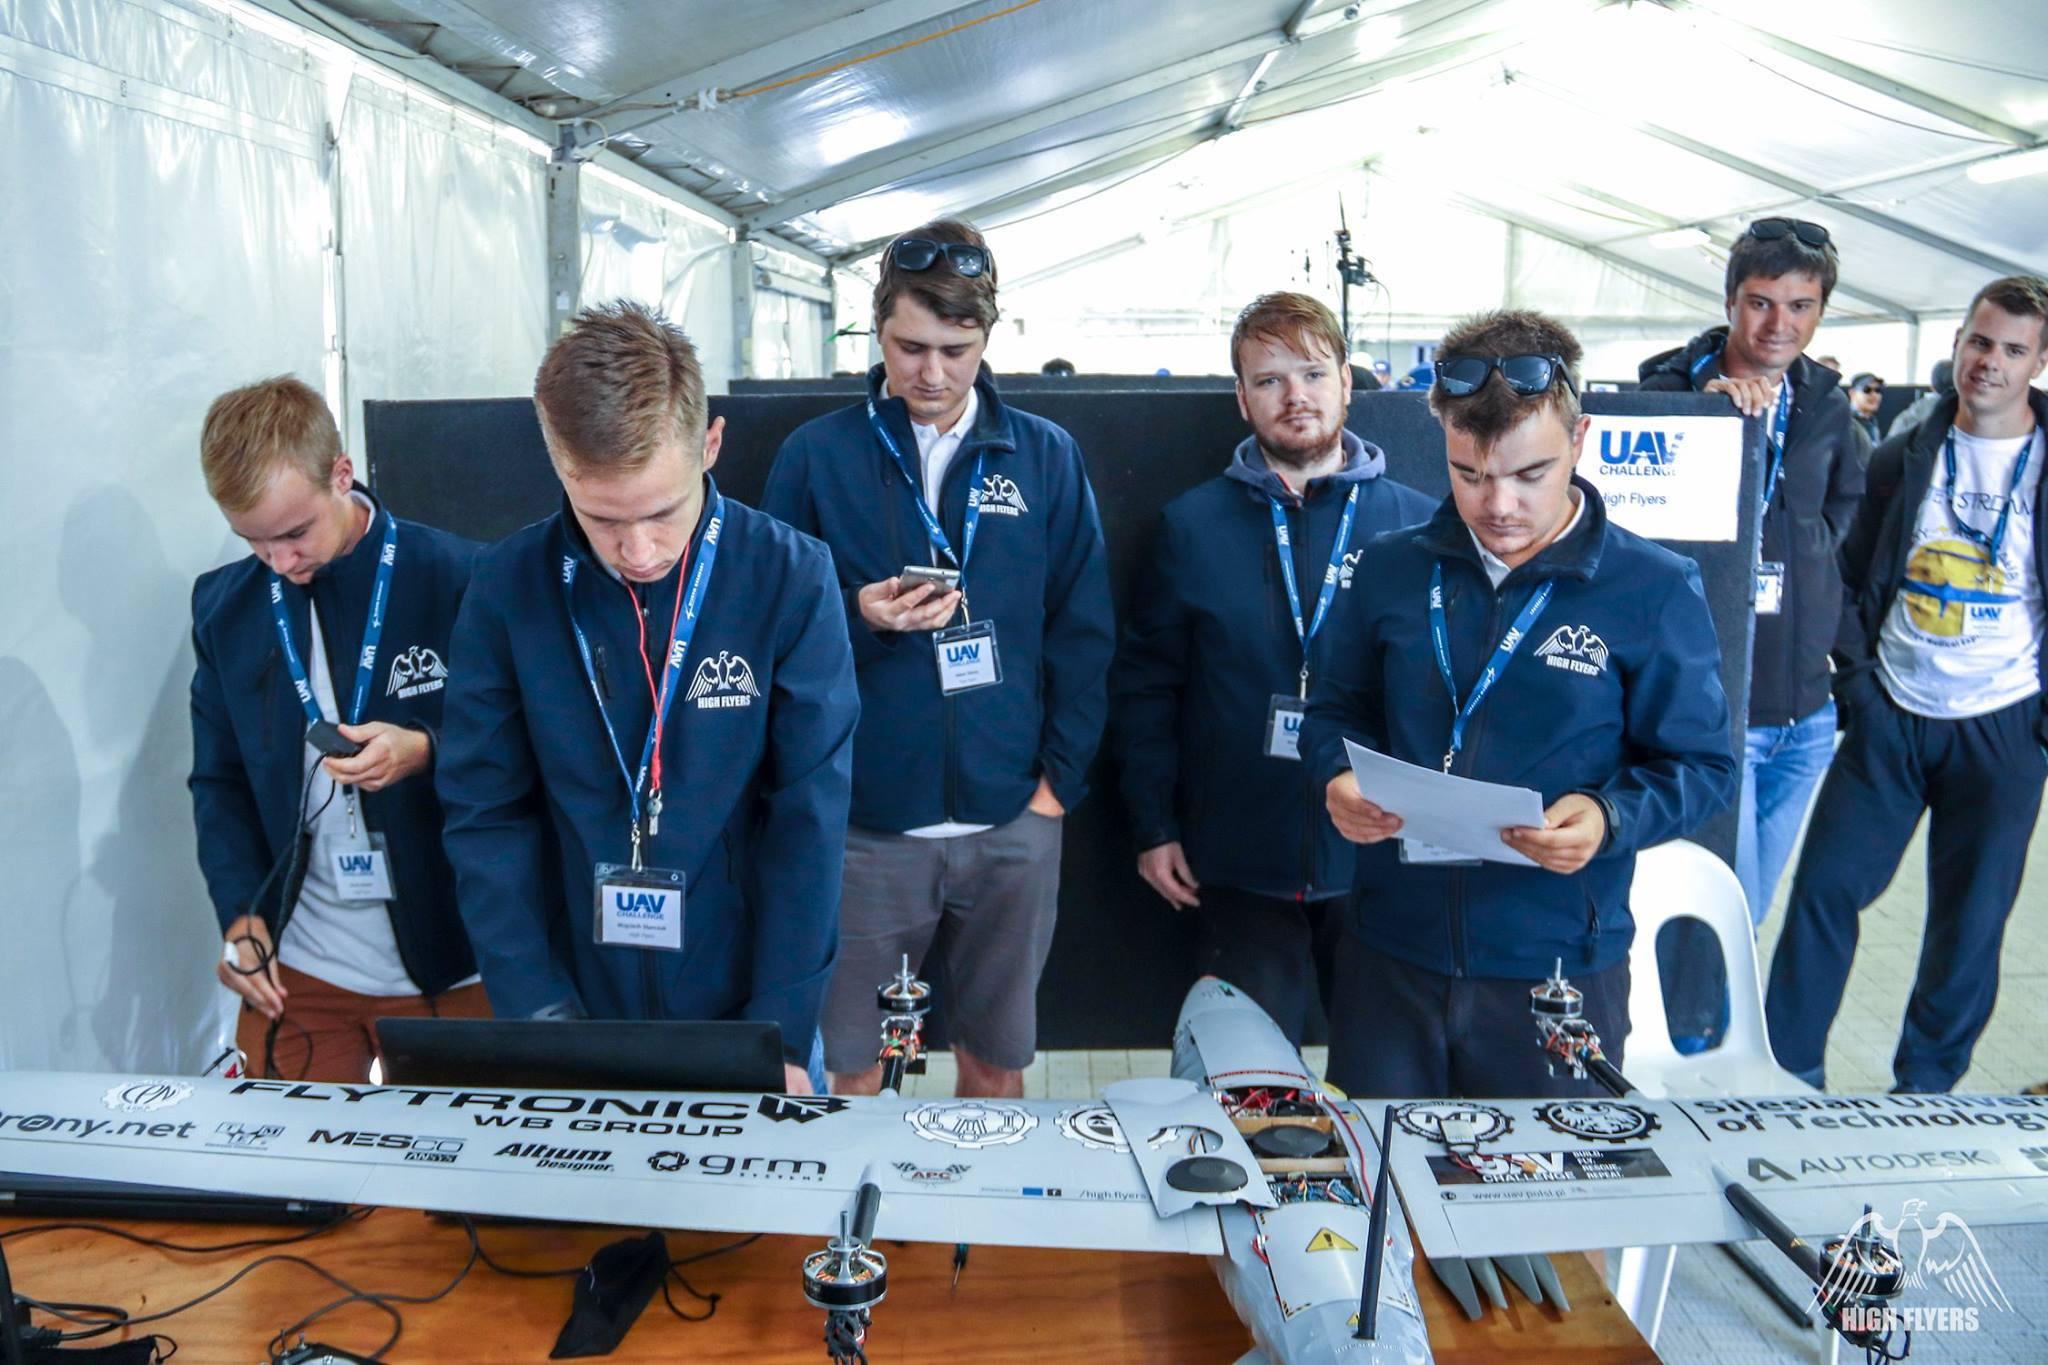 High Flyers na UAV Challenge 2018